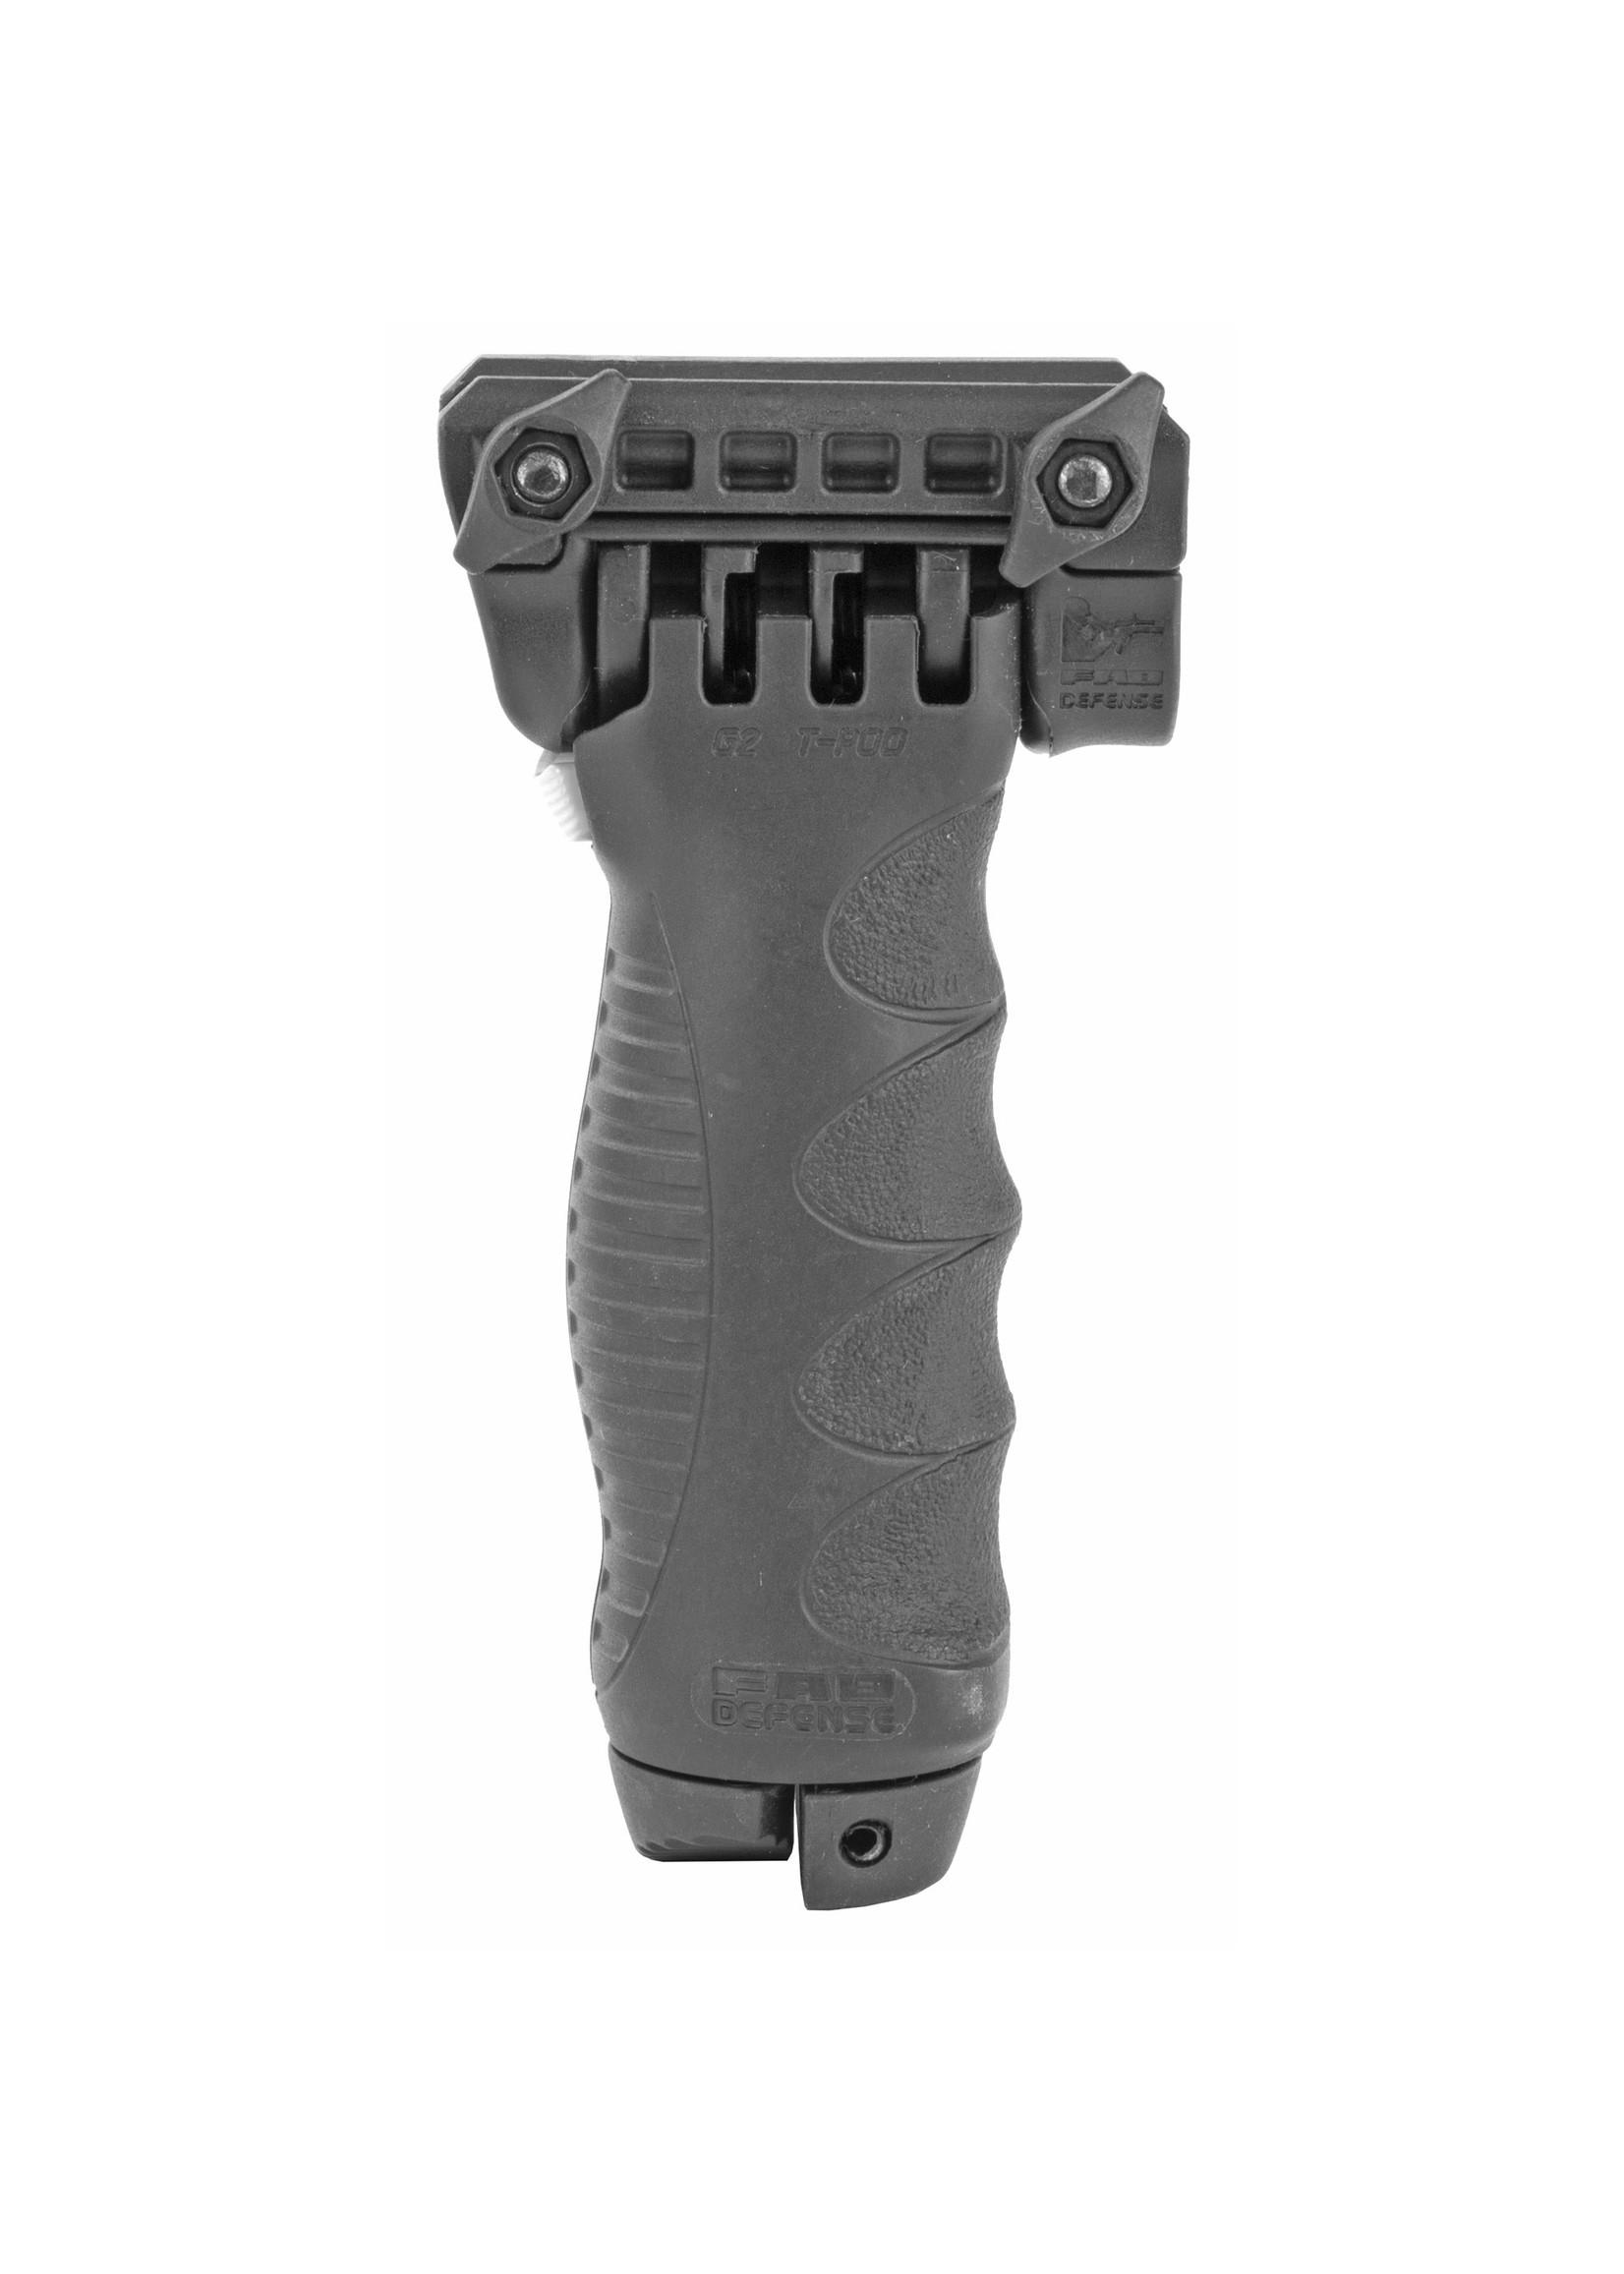 F.A.B. FAB Defense, T-POD G2 QR Foregrip with Quick Release Bipod, Fits Picatinny Rails, Black